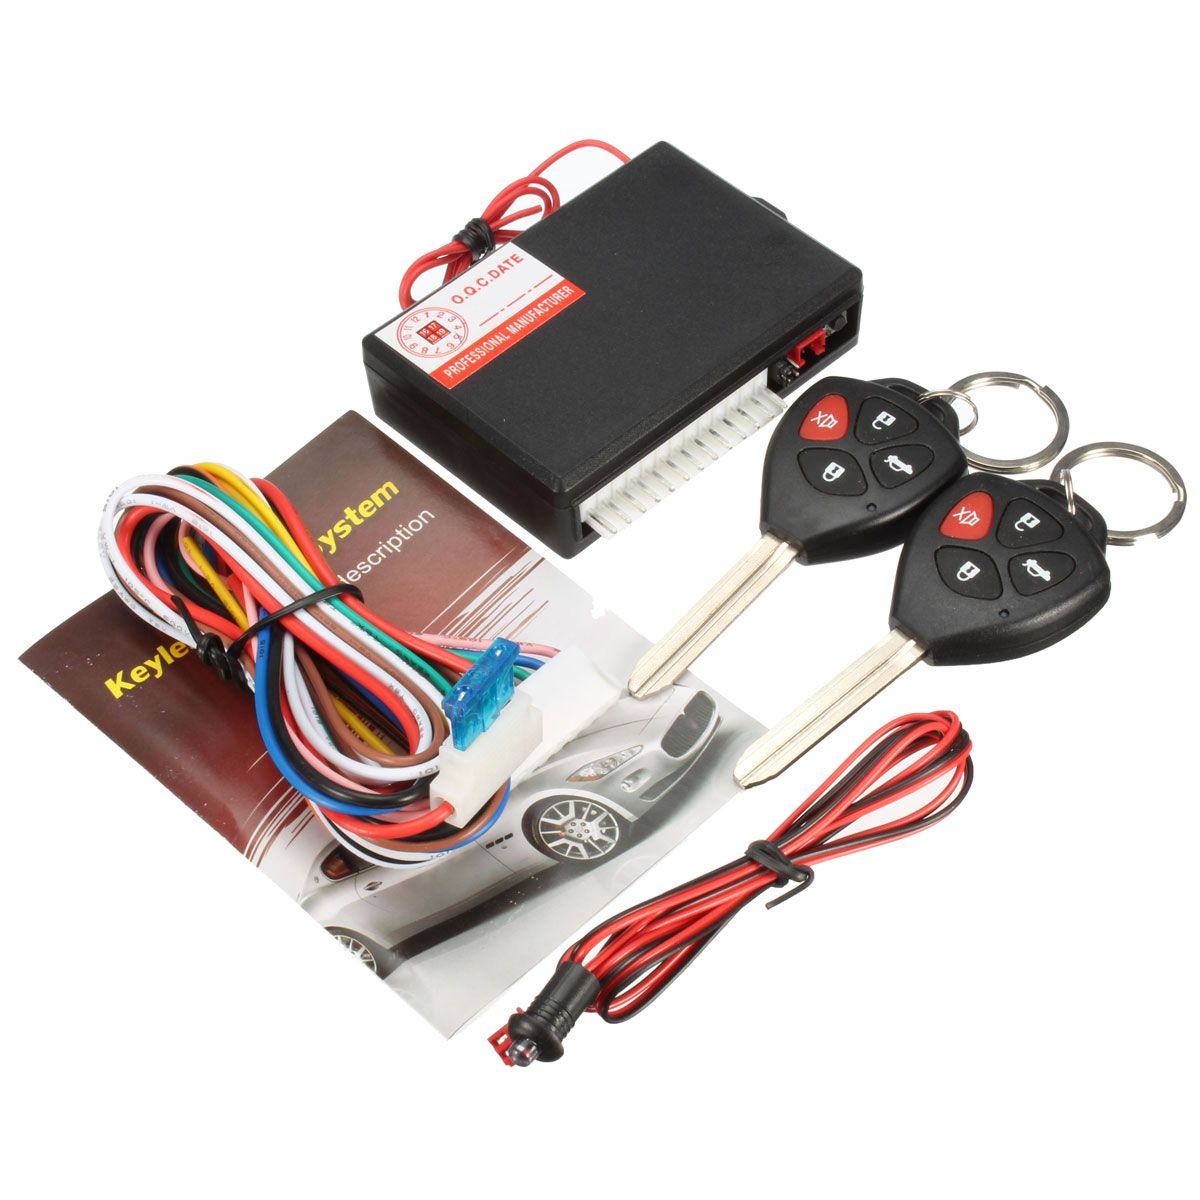 Lowest Price Black 12V Car Vehicle Burglar Alarm Keyless Lock Entry Security System For Toyota 2 Remote